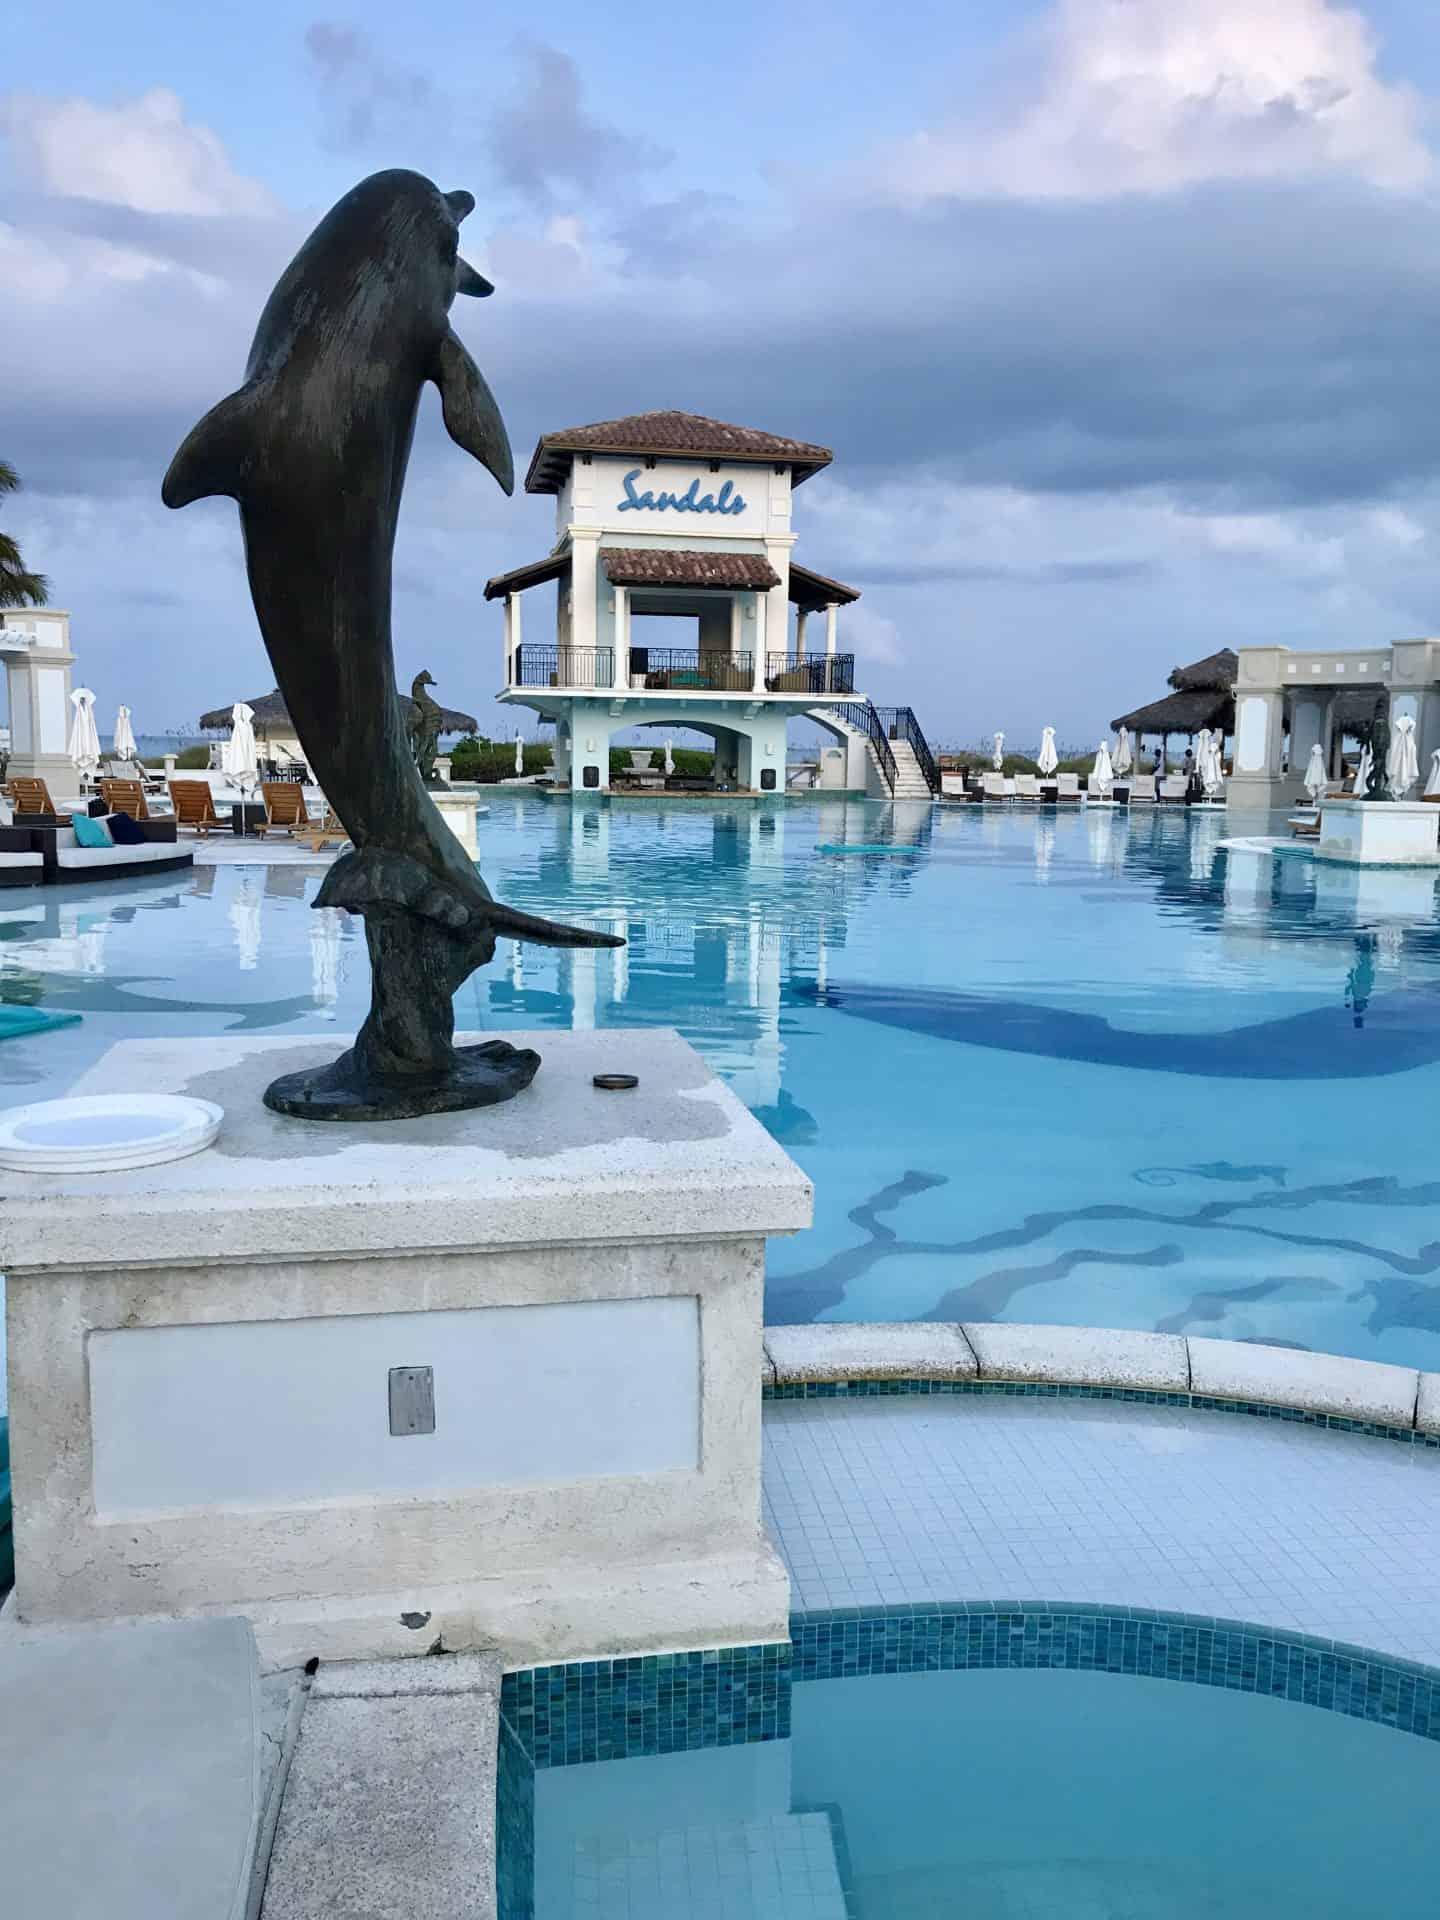 Sandals Exuma Bahamas